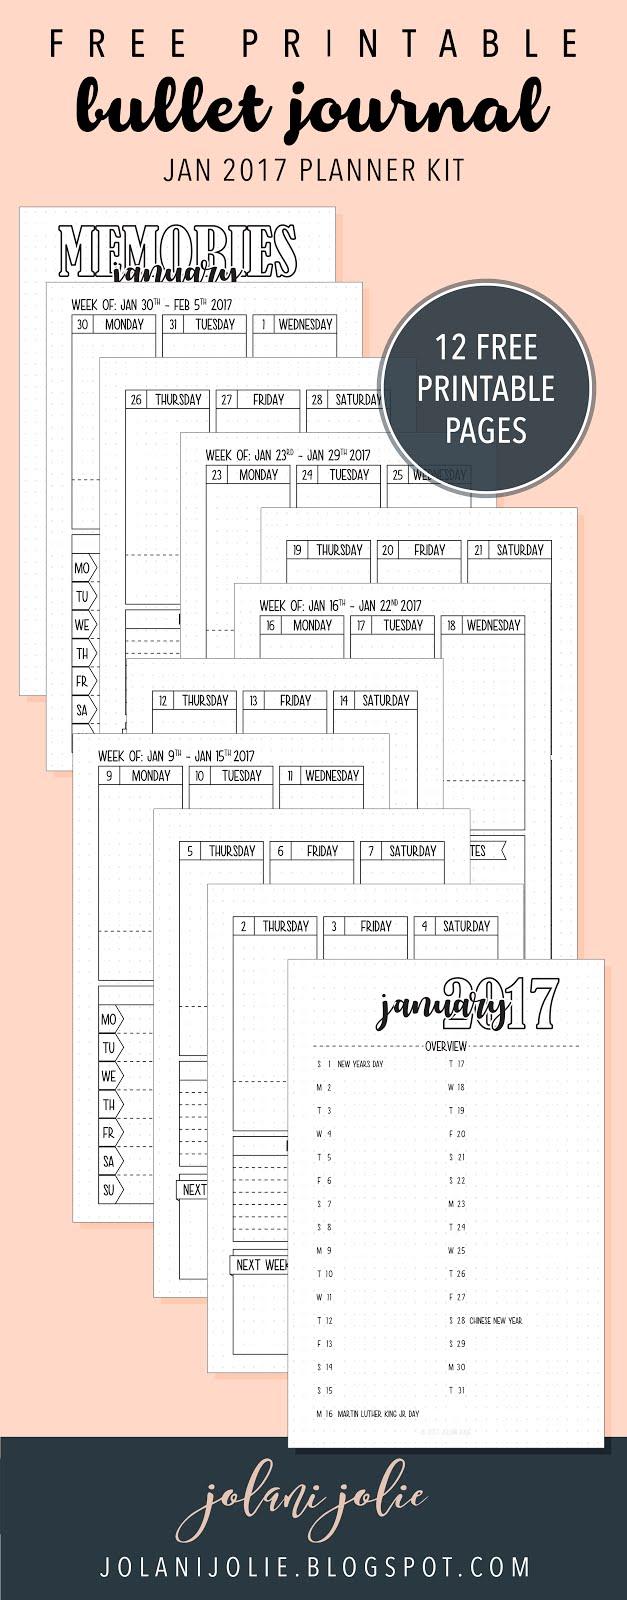 free printable bullet journal january 2017 kit jolani jolie. Black Bedroom Furniture Sets. Home Design Ideas